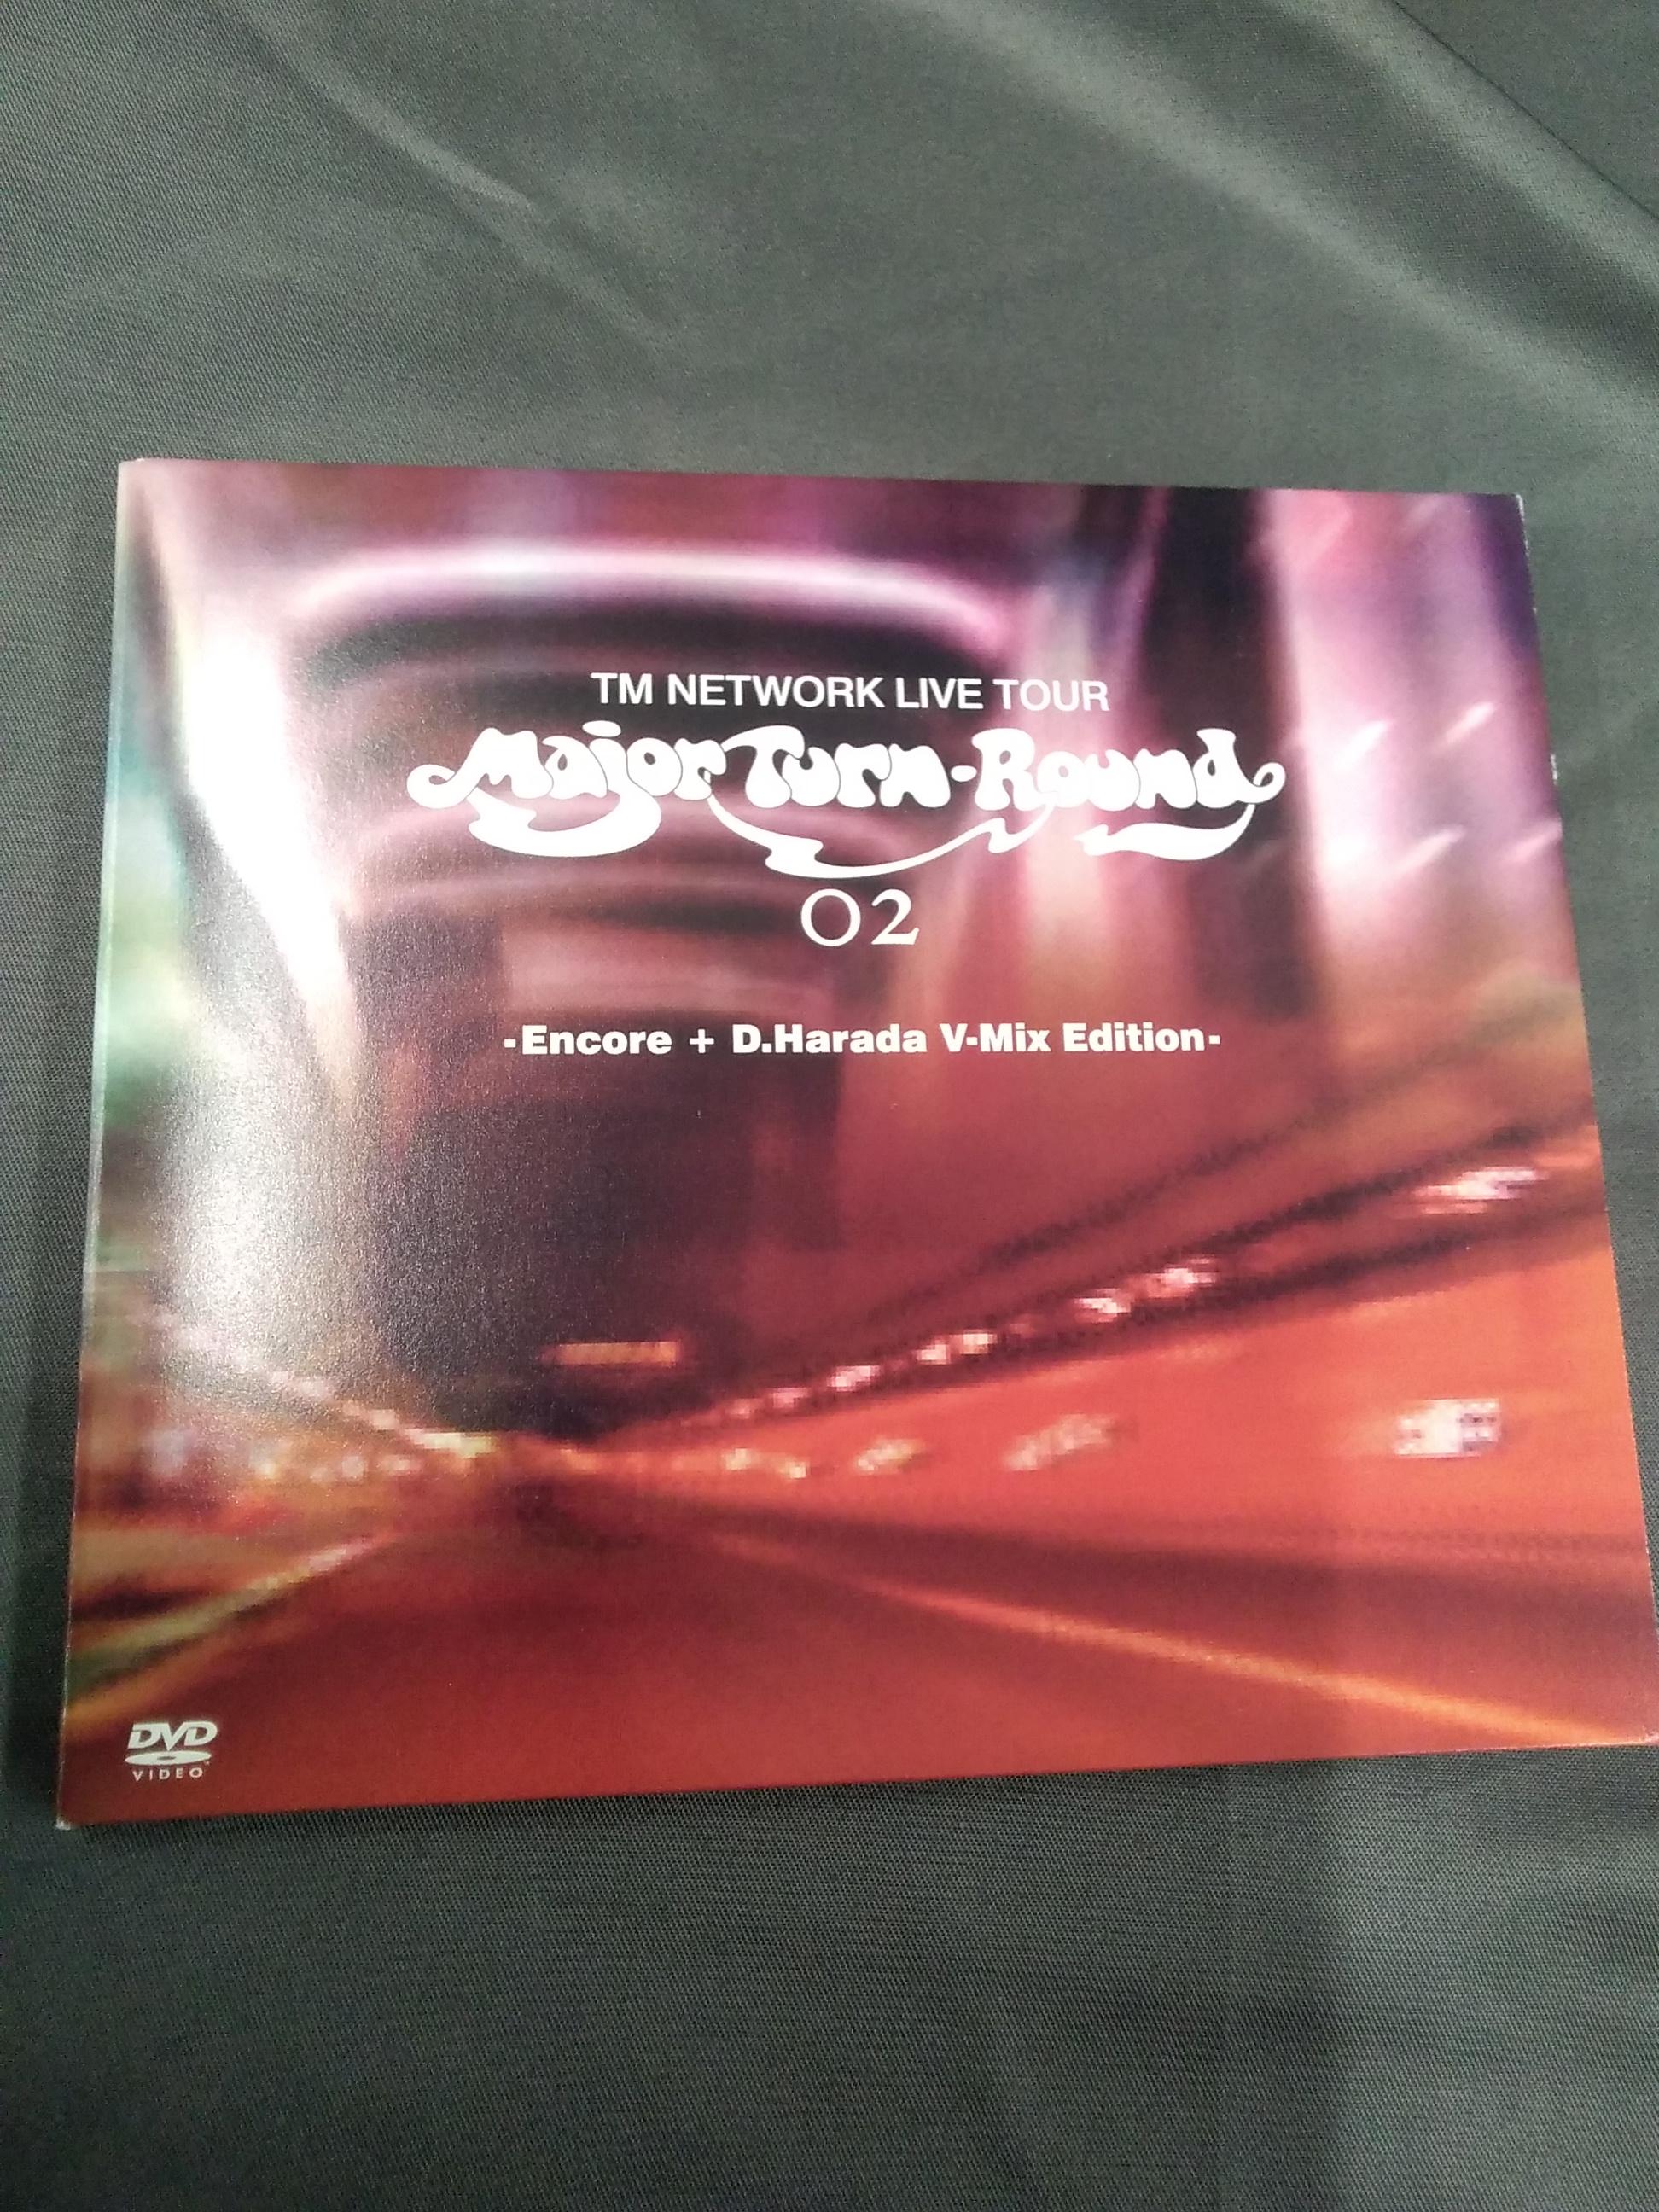 [TM NETEORKのコンサートツアー模様をを収めた作品]|PONY CANYON